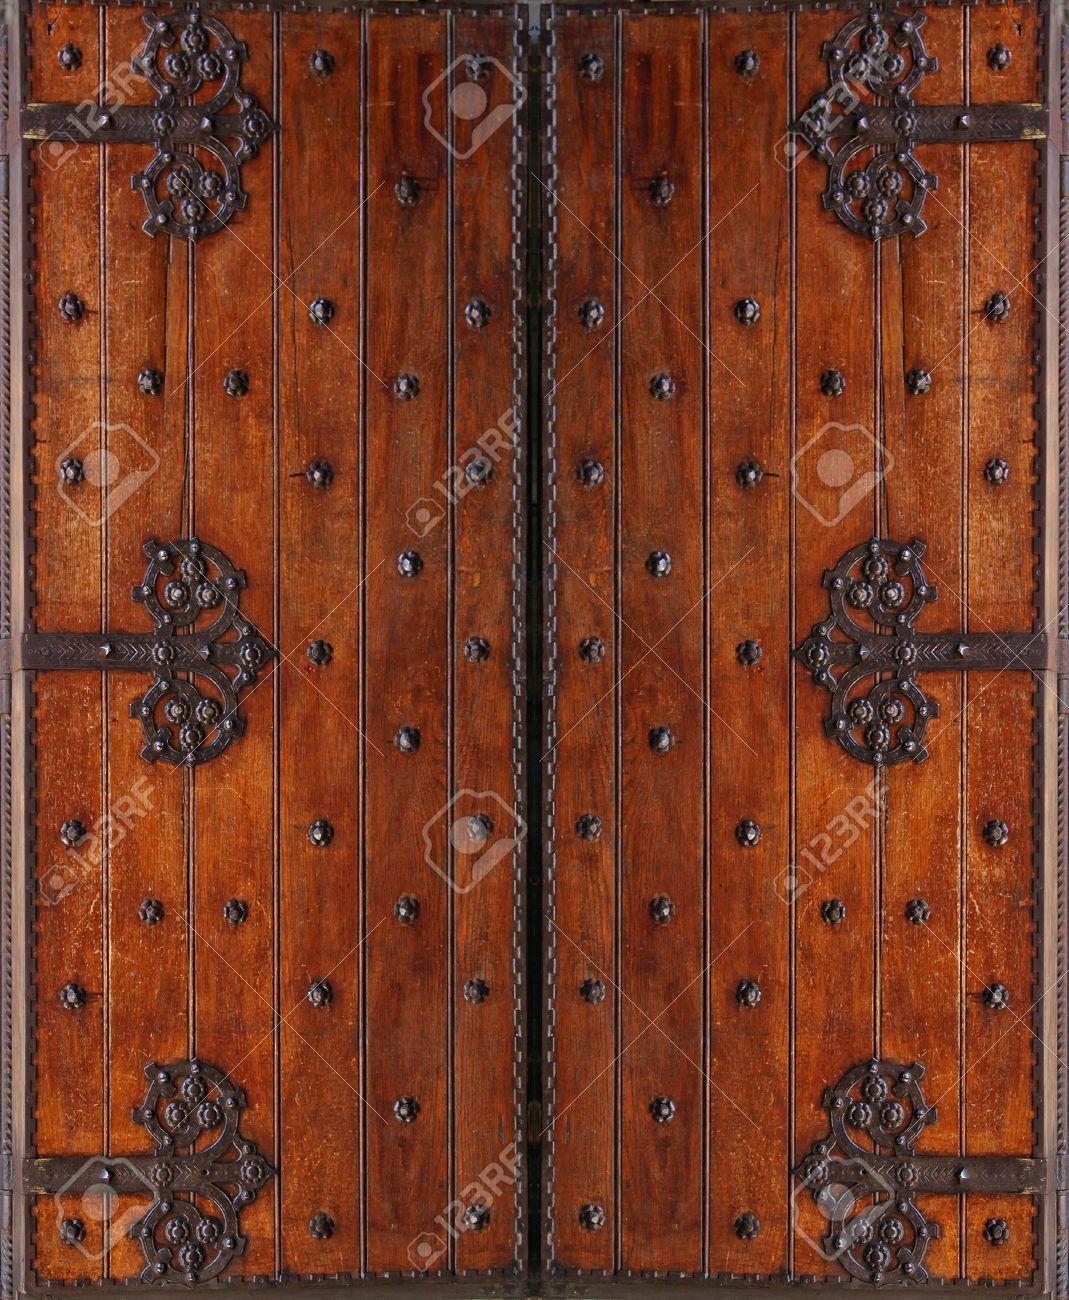 Antique style wooden double folding entrance door Stock Photo - 15565494 - Antique Style Wooden Double Folding Entrance Door Stock Photo